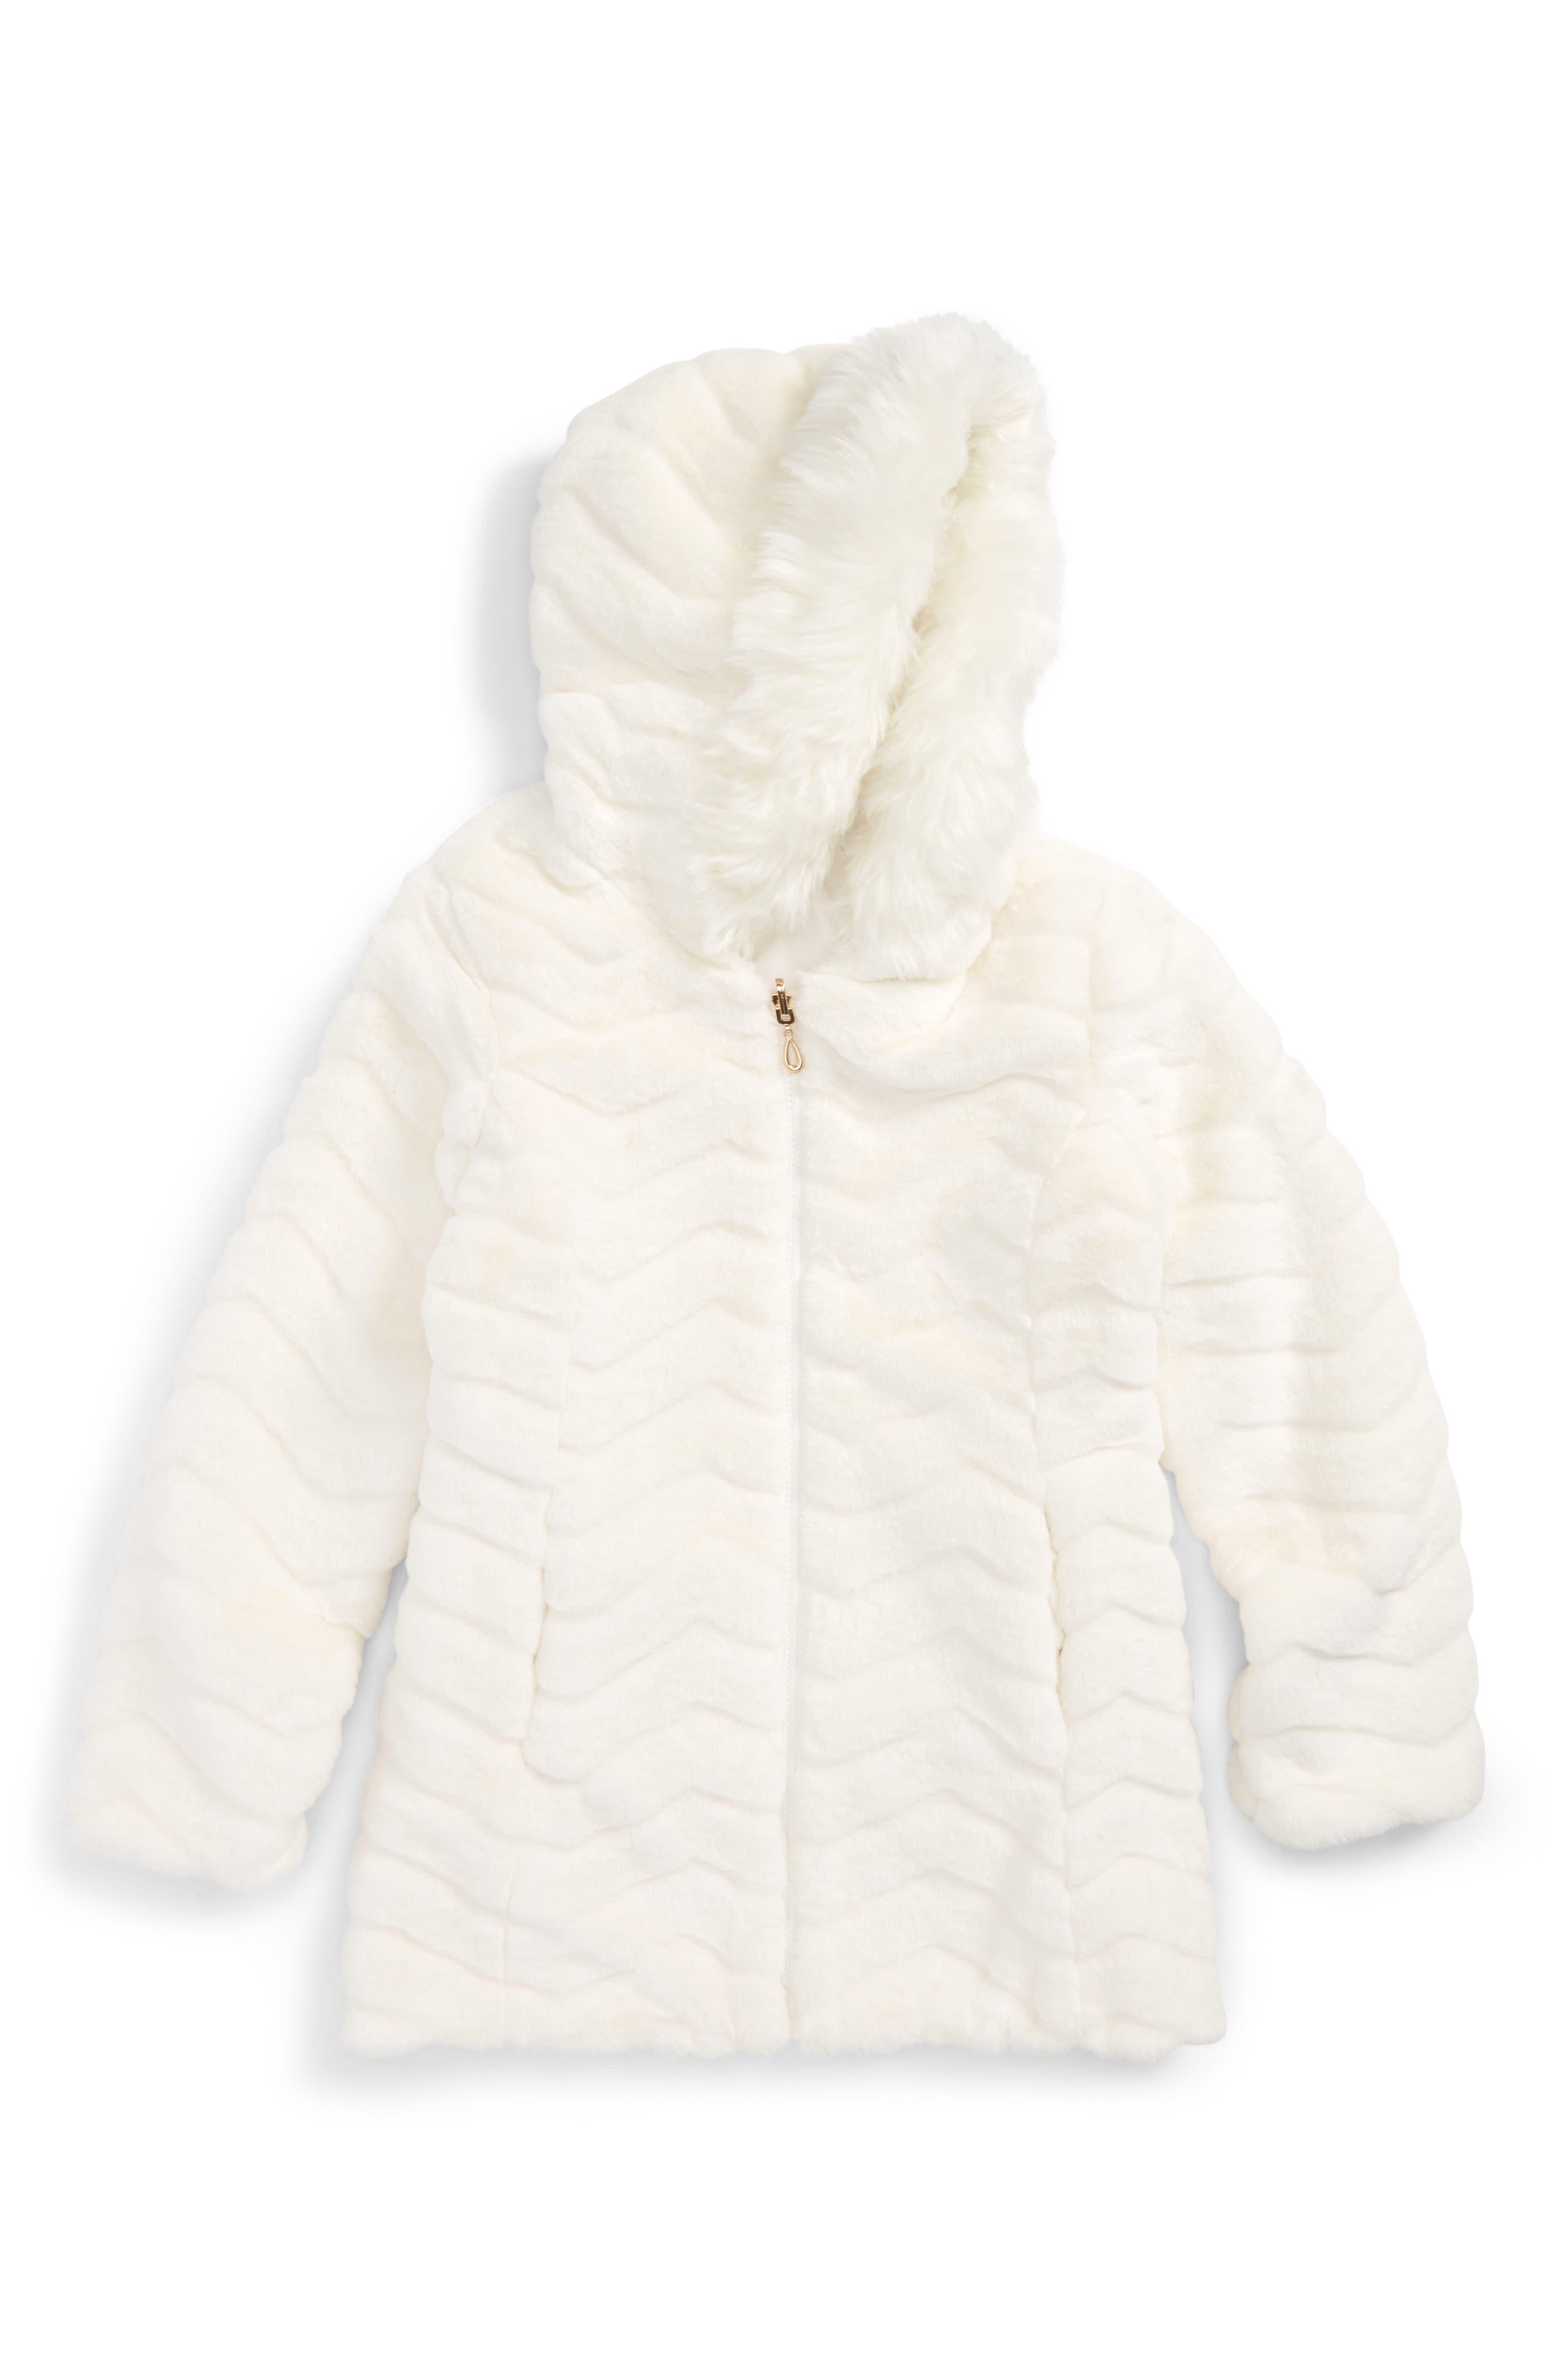 Reversible Faux Fur Hooded Jacket,                             Main thumbnail 1, color,                             900